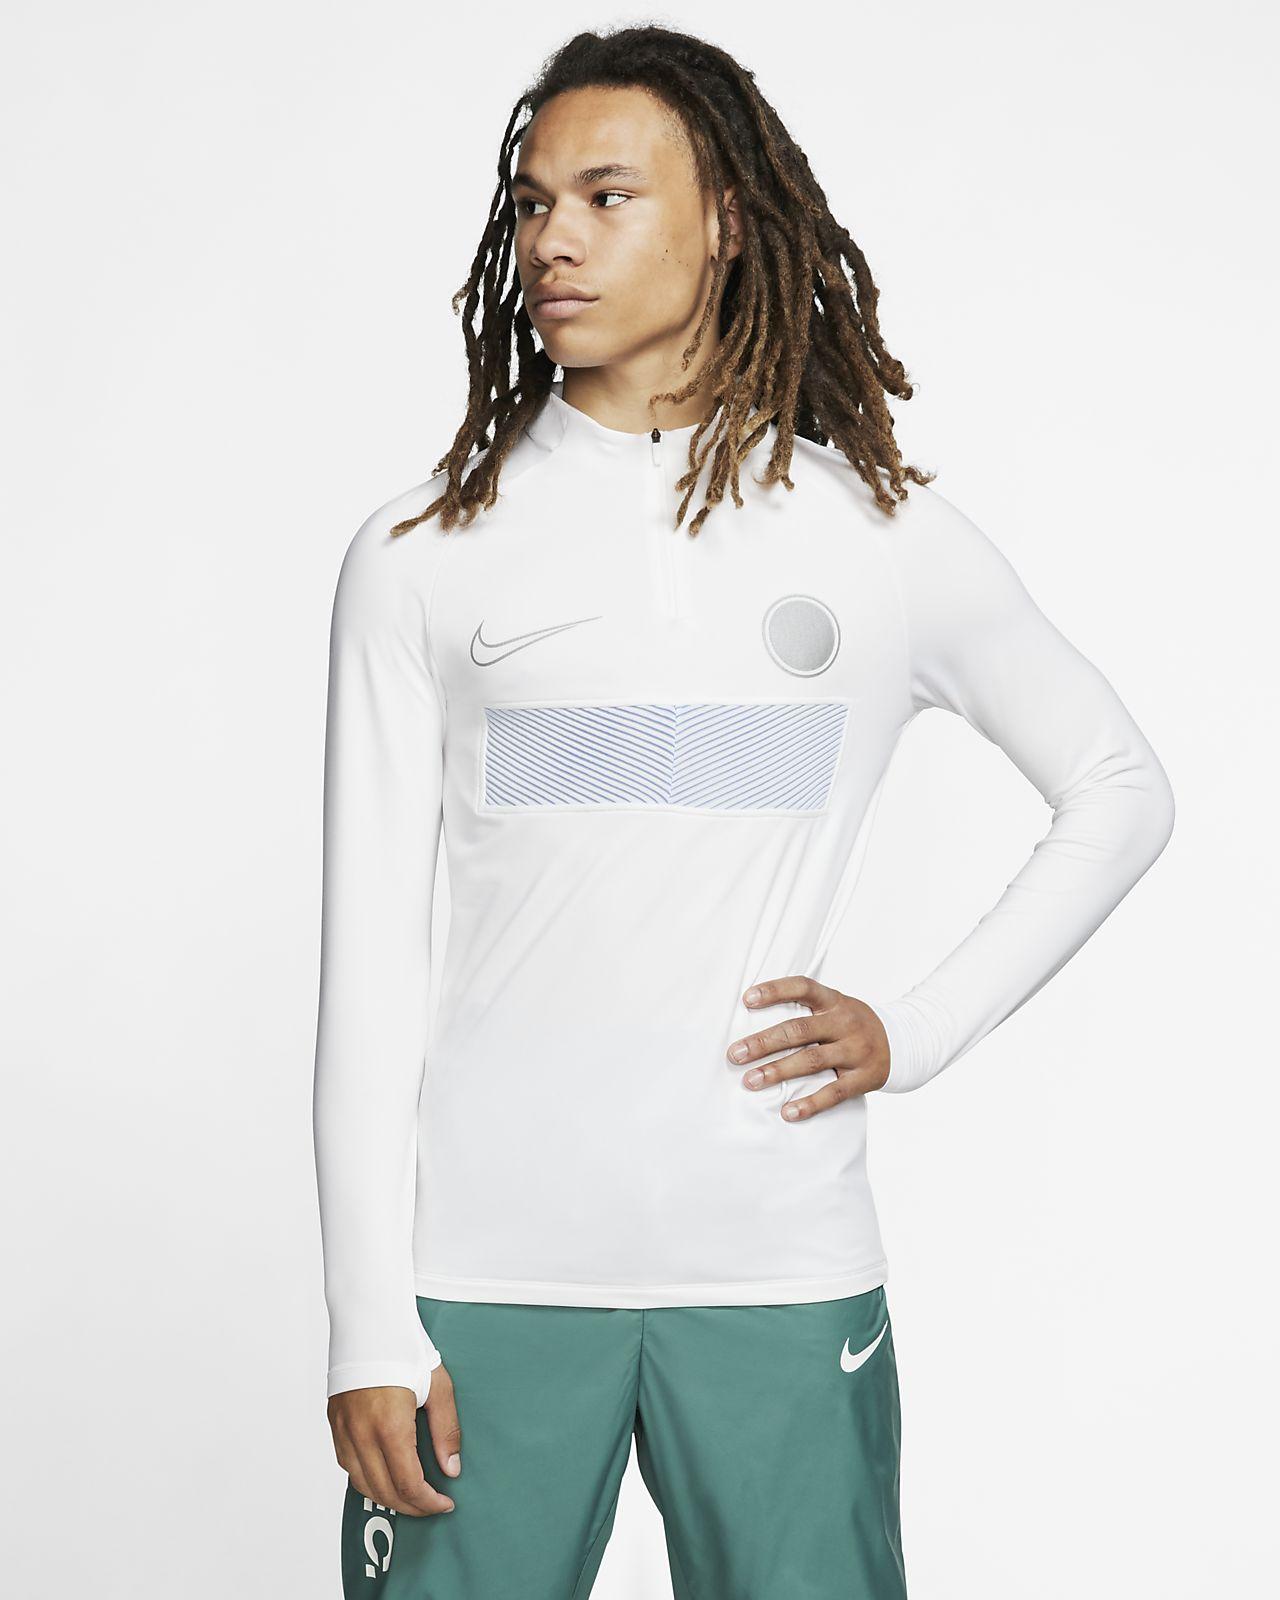 Мужская футболка для футбольного тренинга Nike AeroAdapt Strike